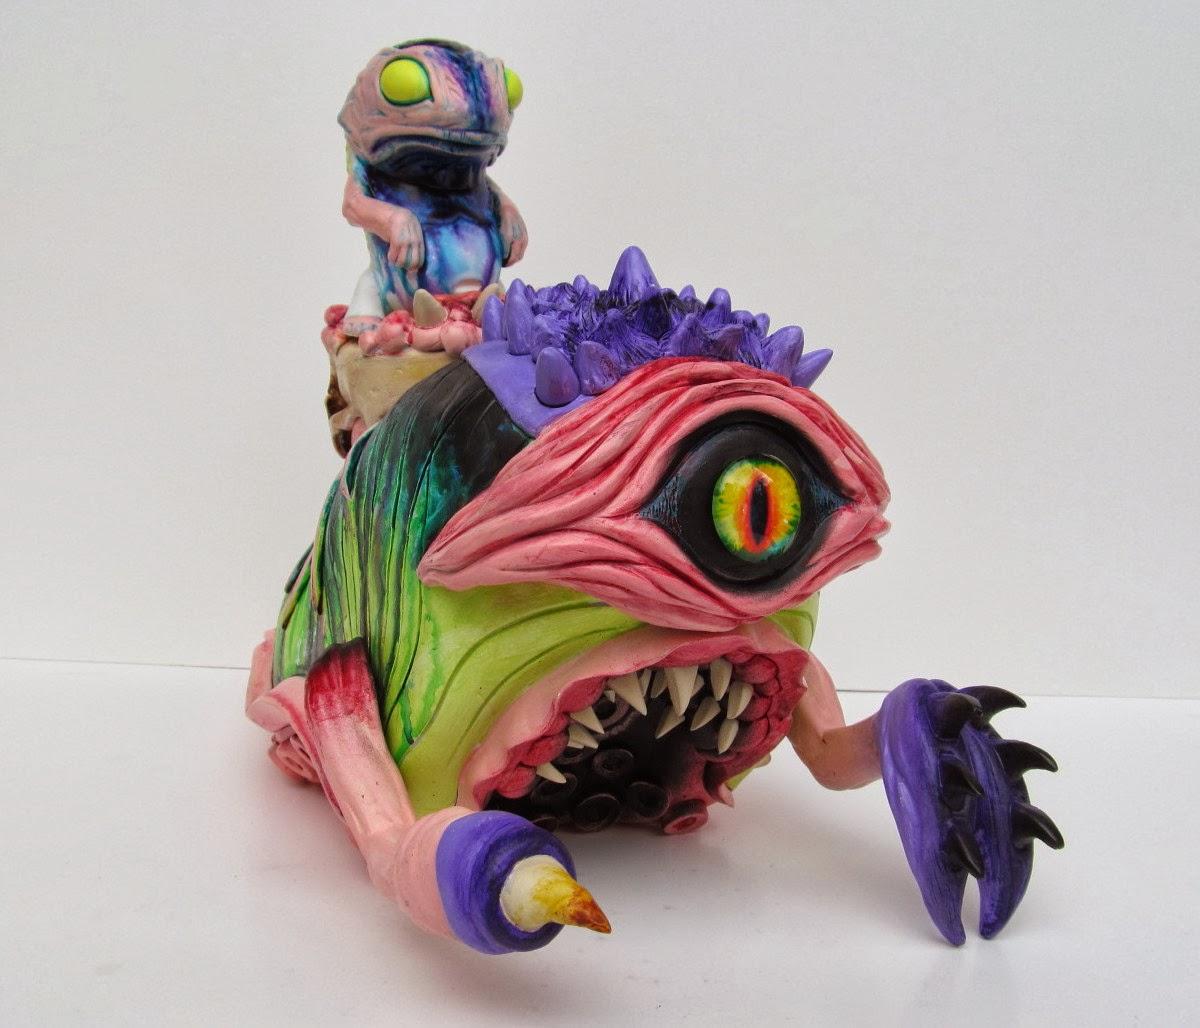 Really Weird Toys : Brent nolasco strange days toy art gallery